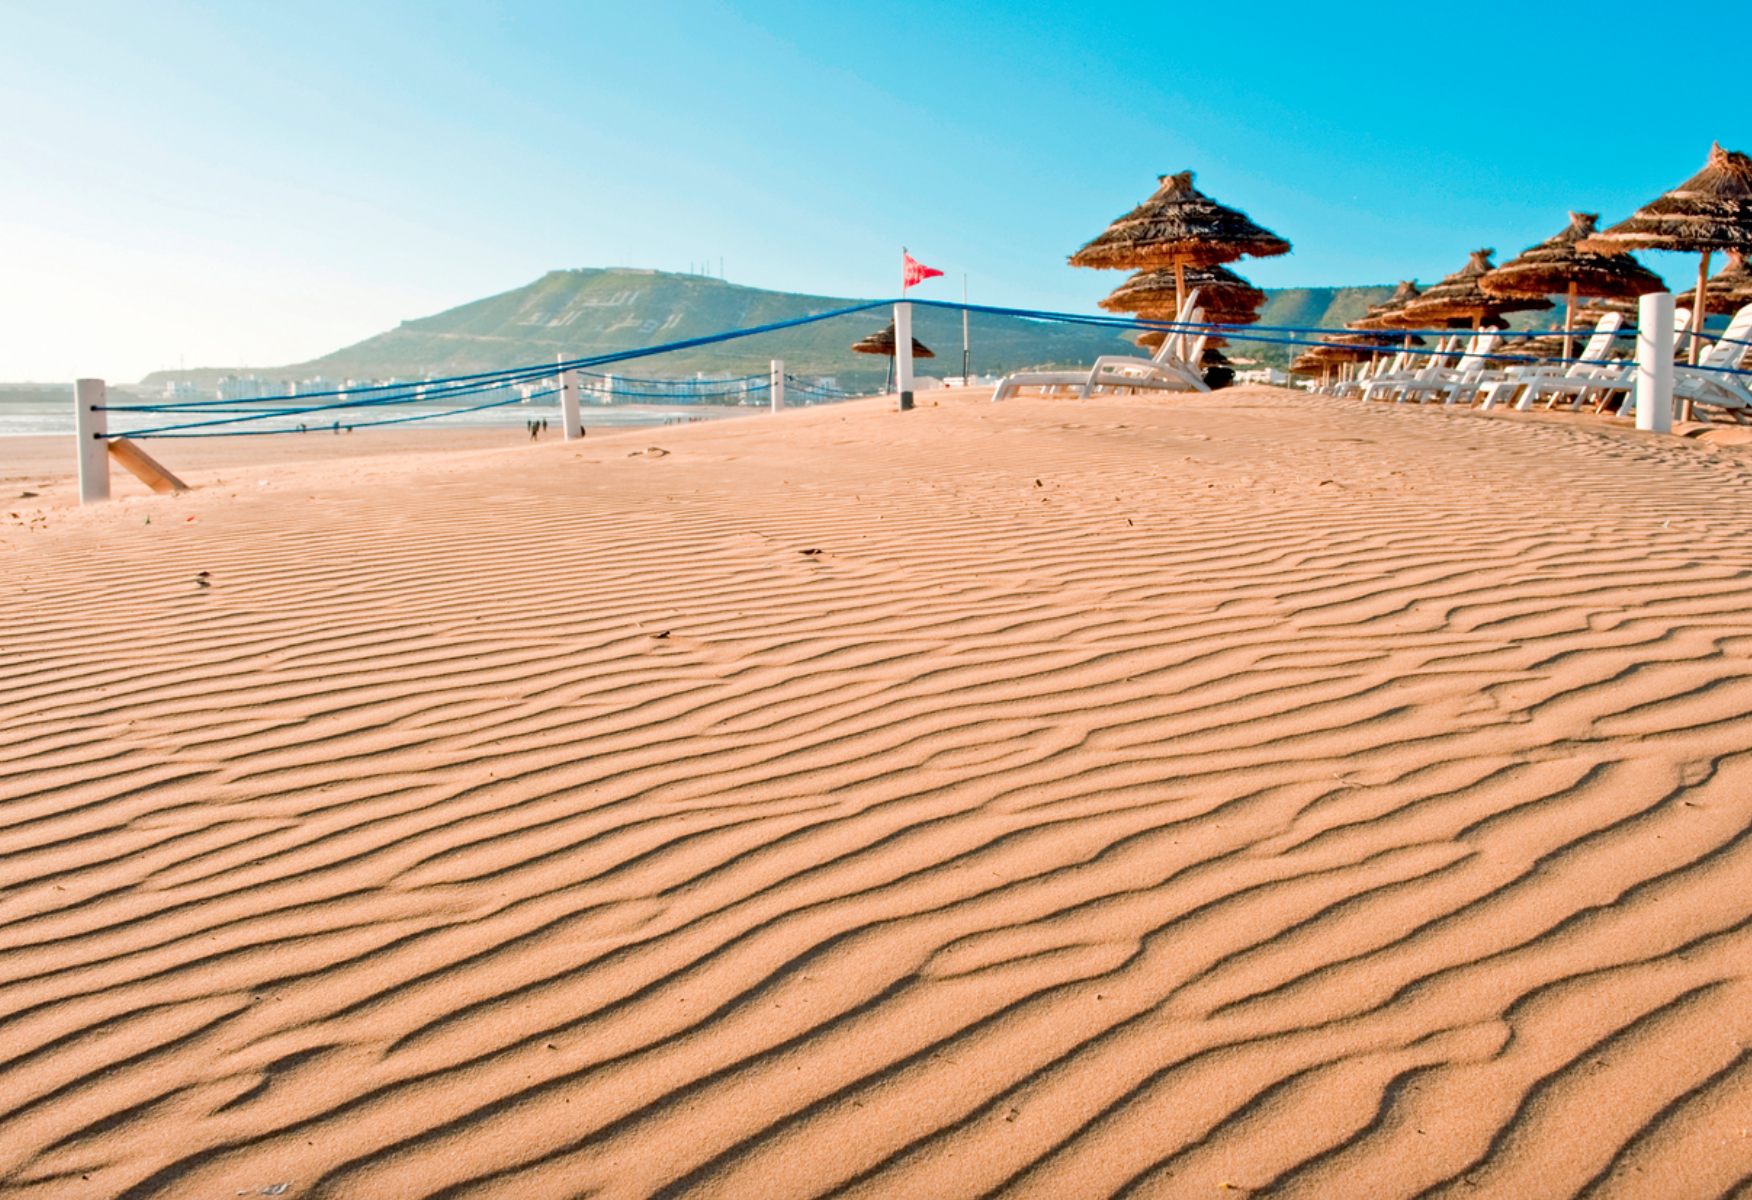 MAROKKO: Agadir og Marrakesh er hotte byer i Nord-Afrika. Foto: STARTOUR.